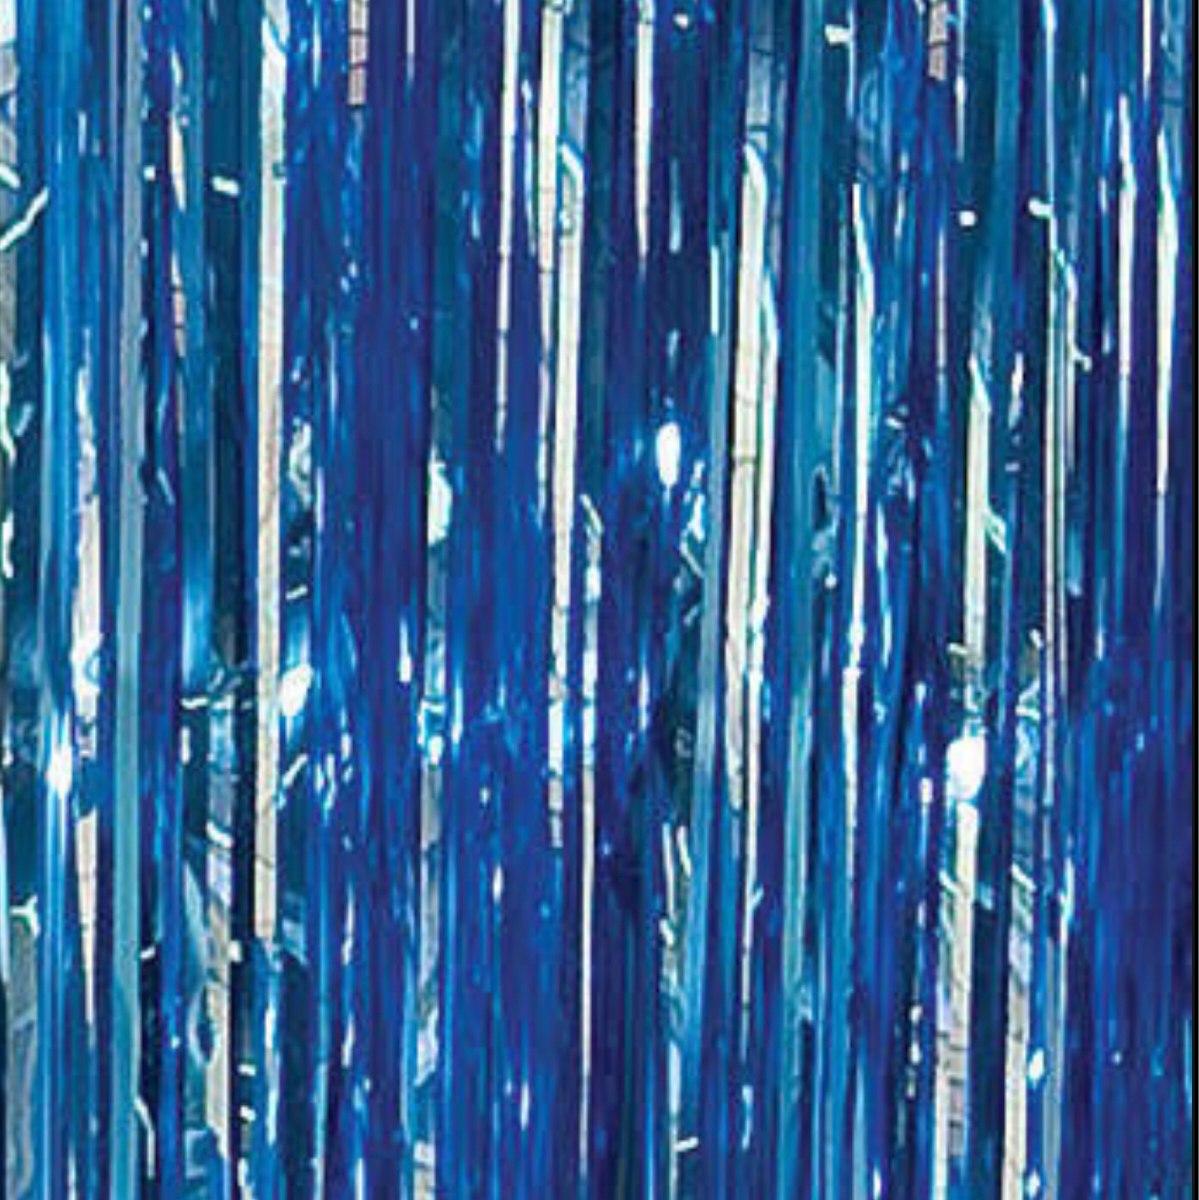 4 Cortinas Metálicas Azules Y 4 Plateadas Para Fiestas